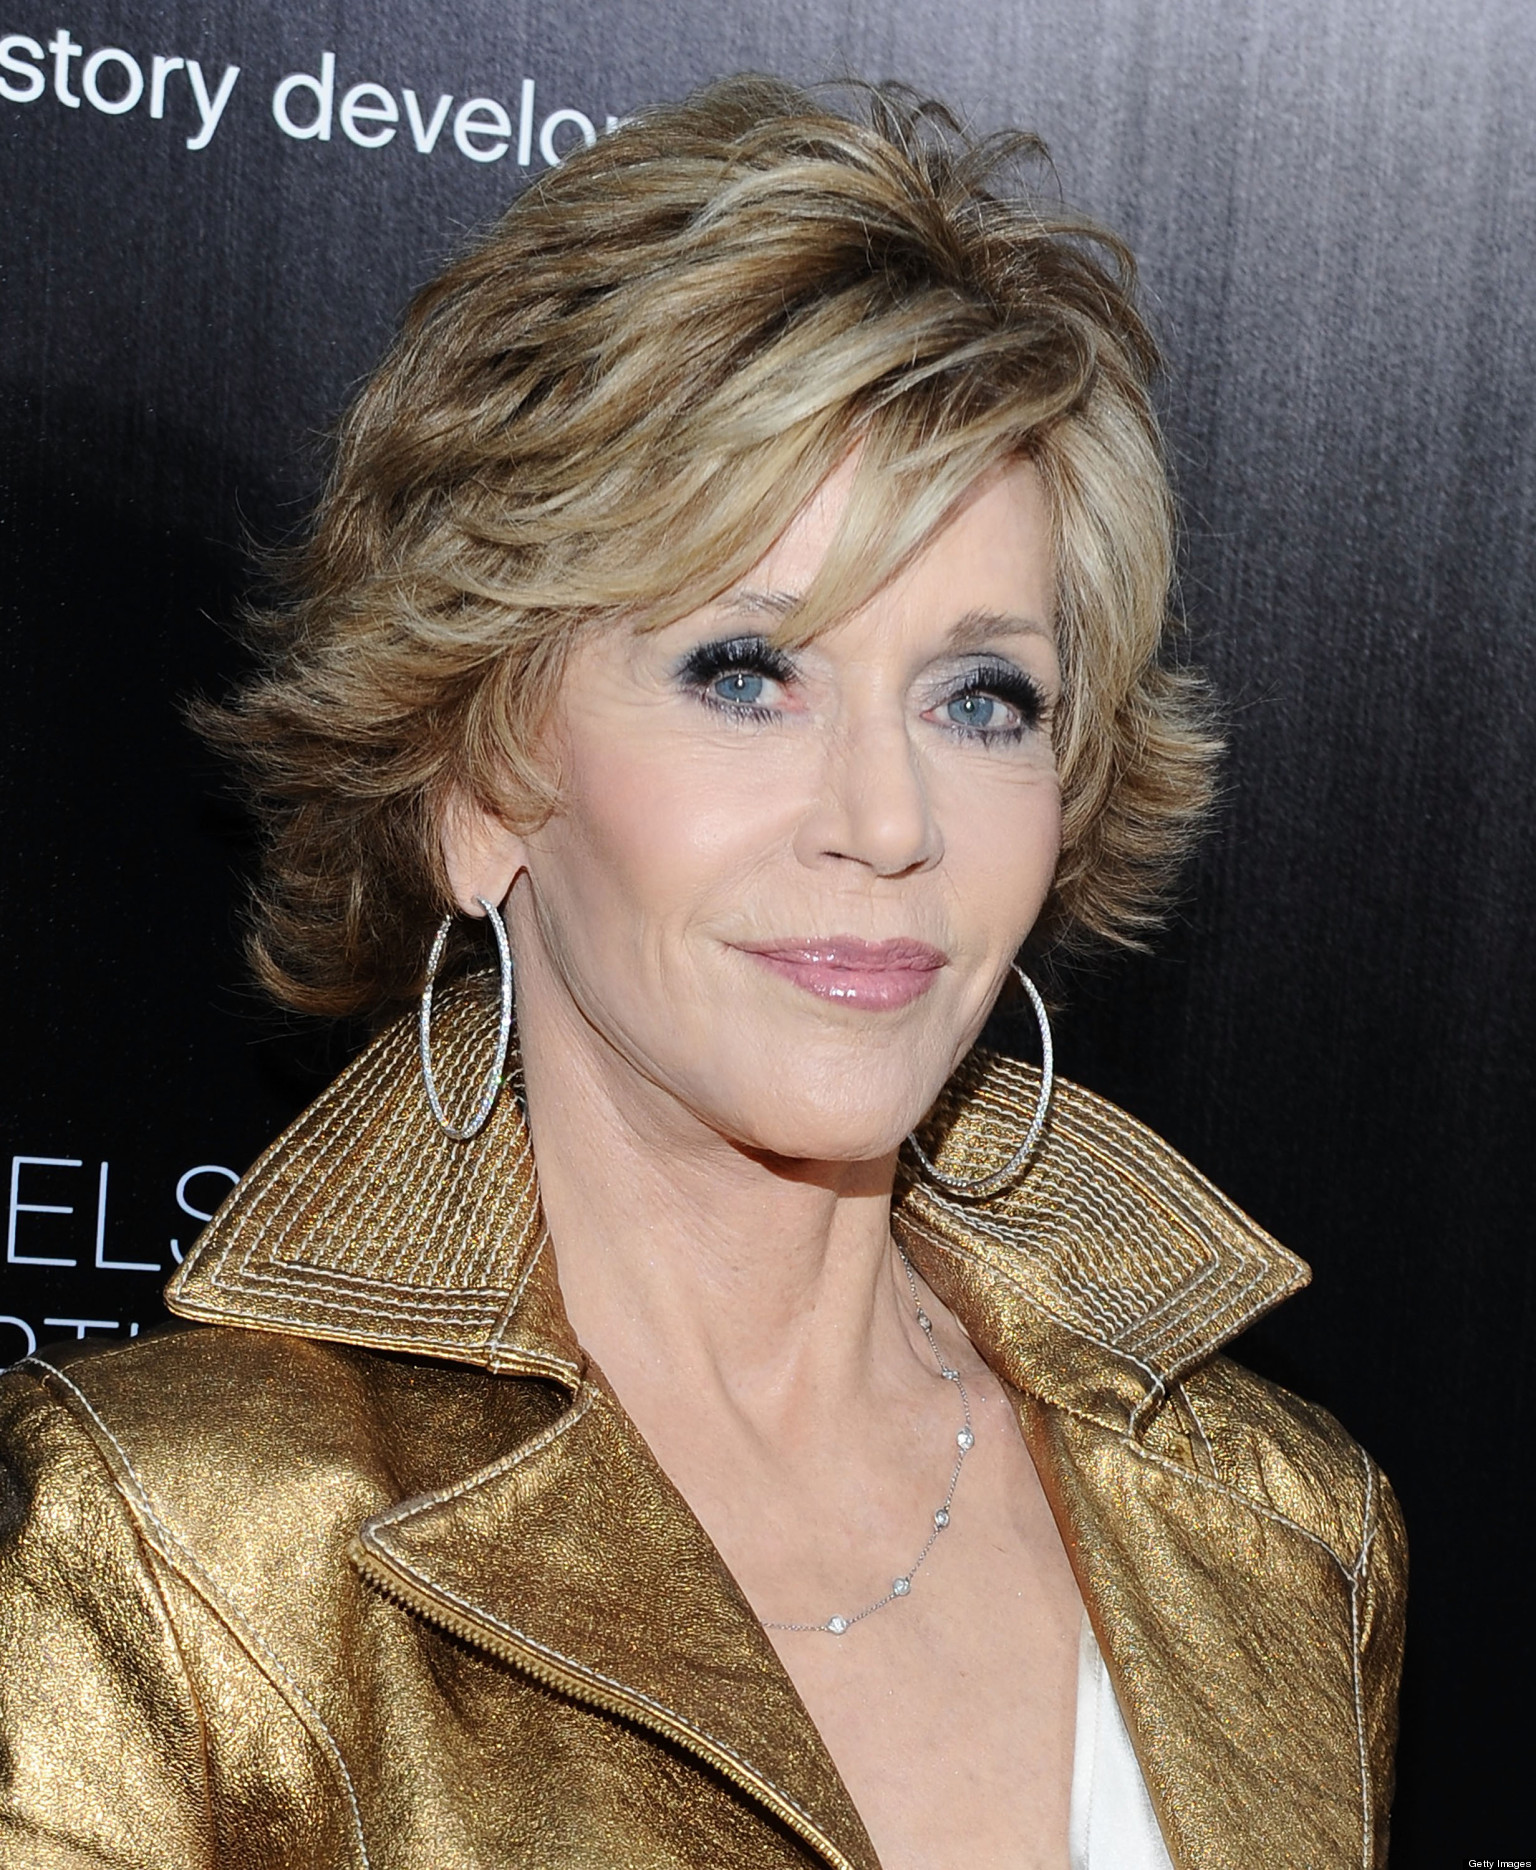 Jane Fonda Sells Hollywood House For $8.5 Million (PHOTOS) | HuffPost